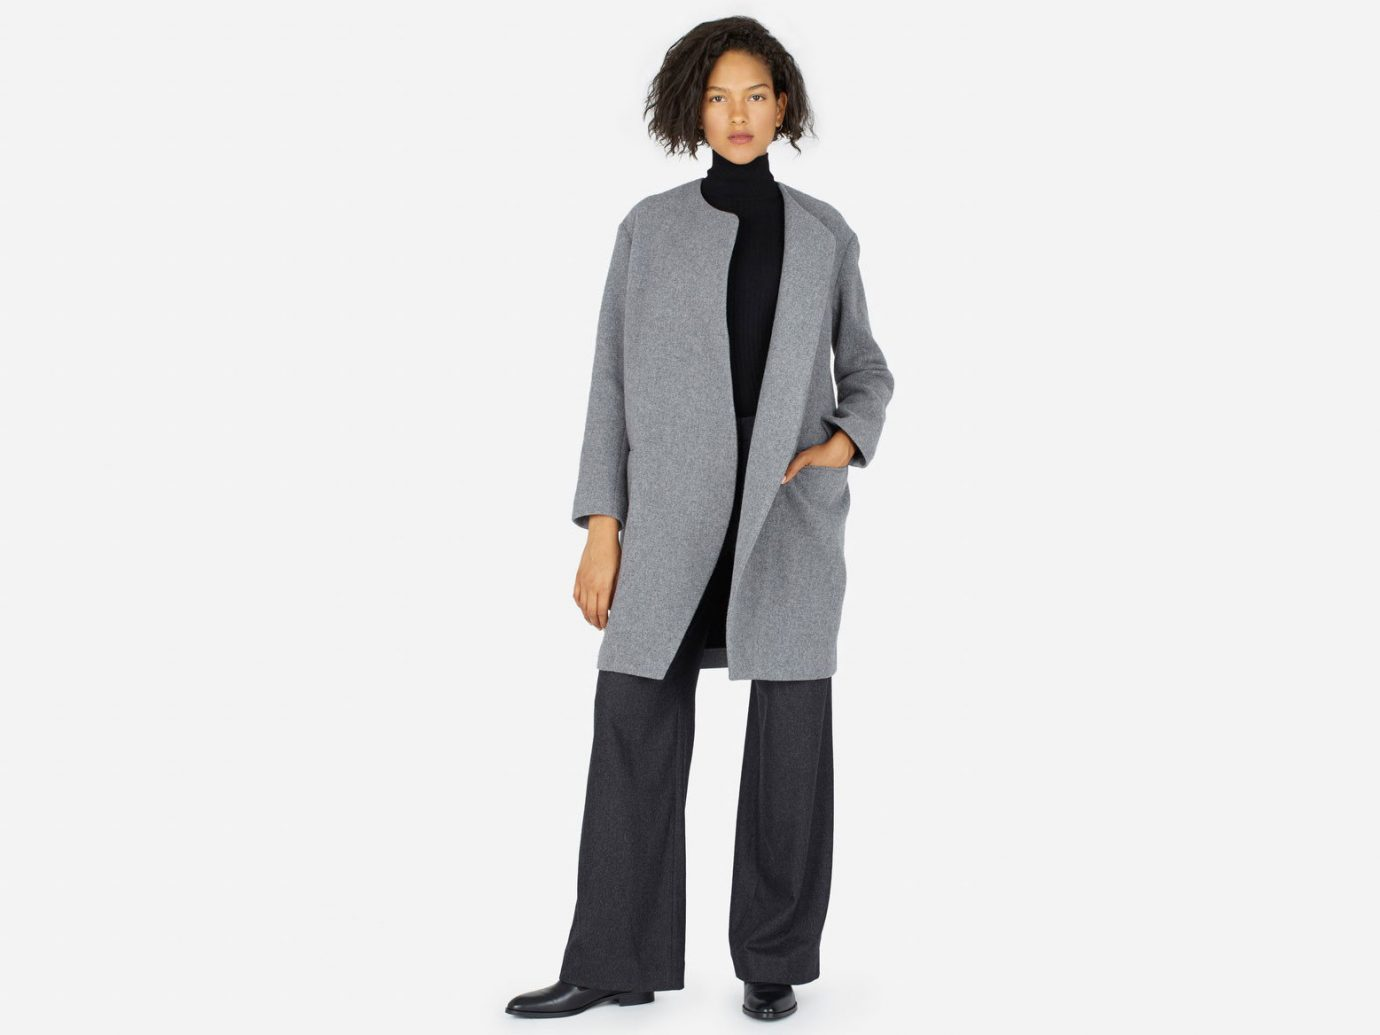 Style + Design clothing suit outerwear overcoat sleeve formal wear coat tuxedo wool jacket collar dressed